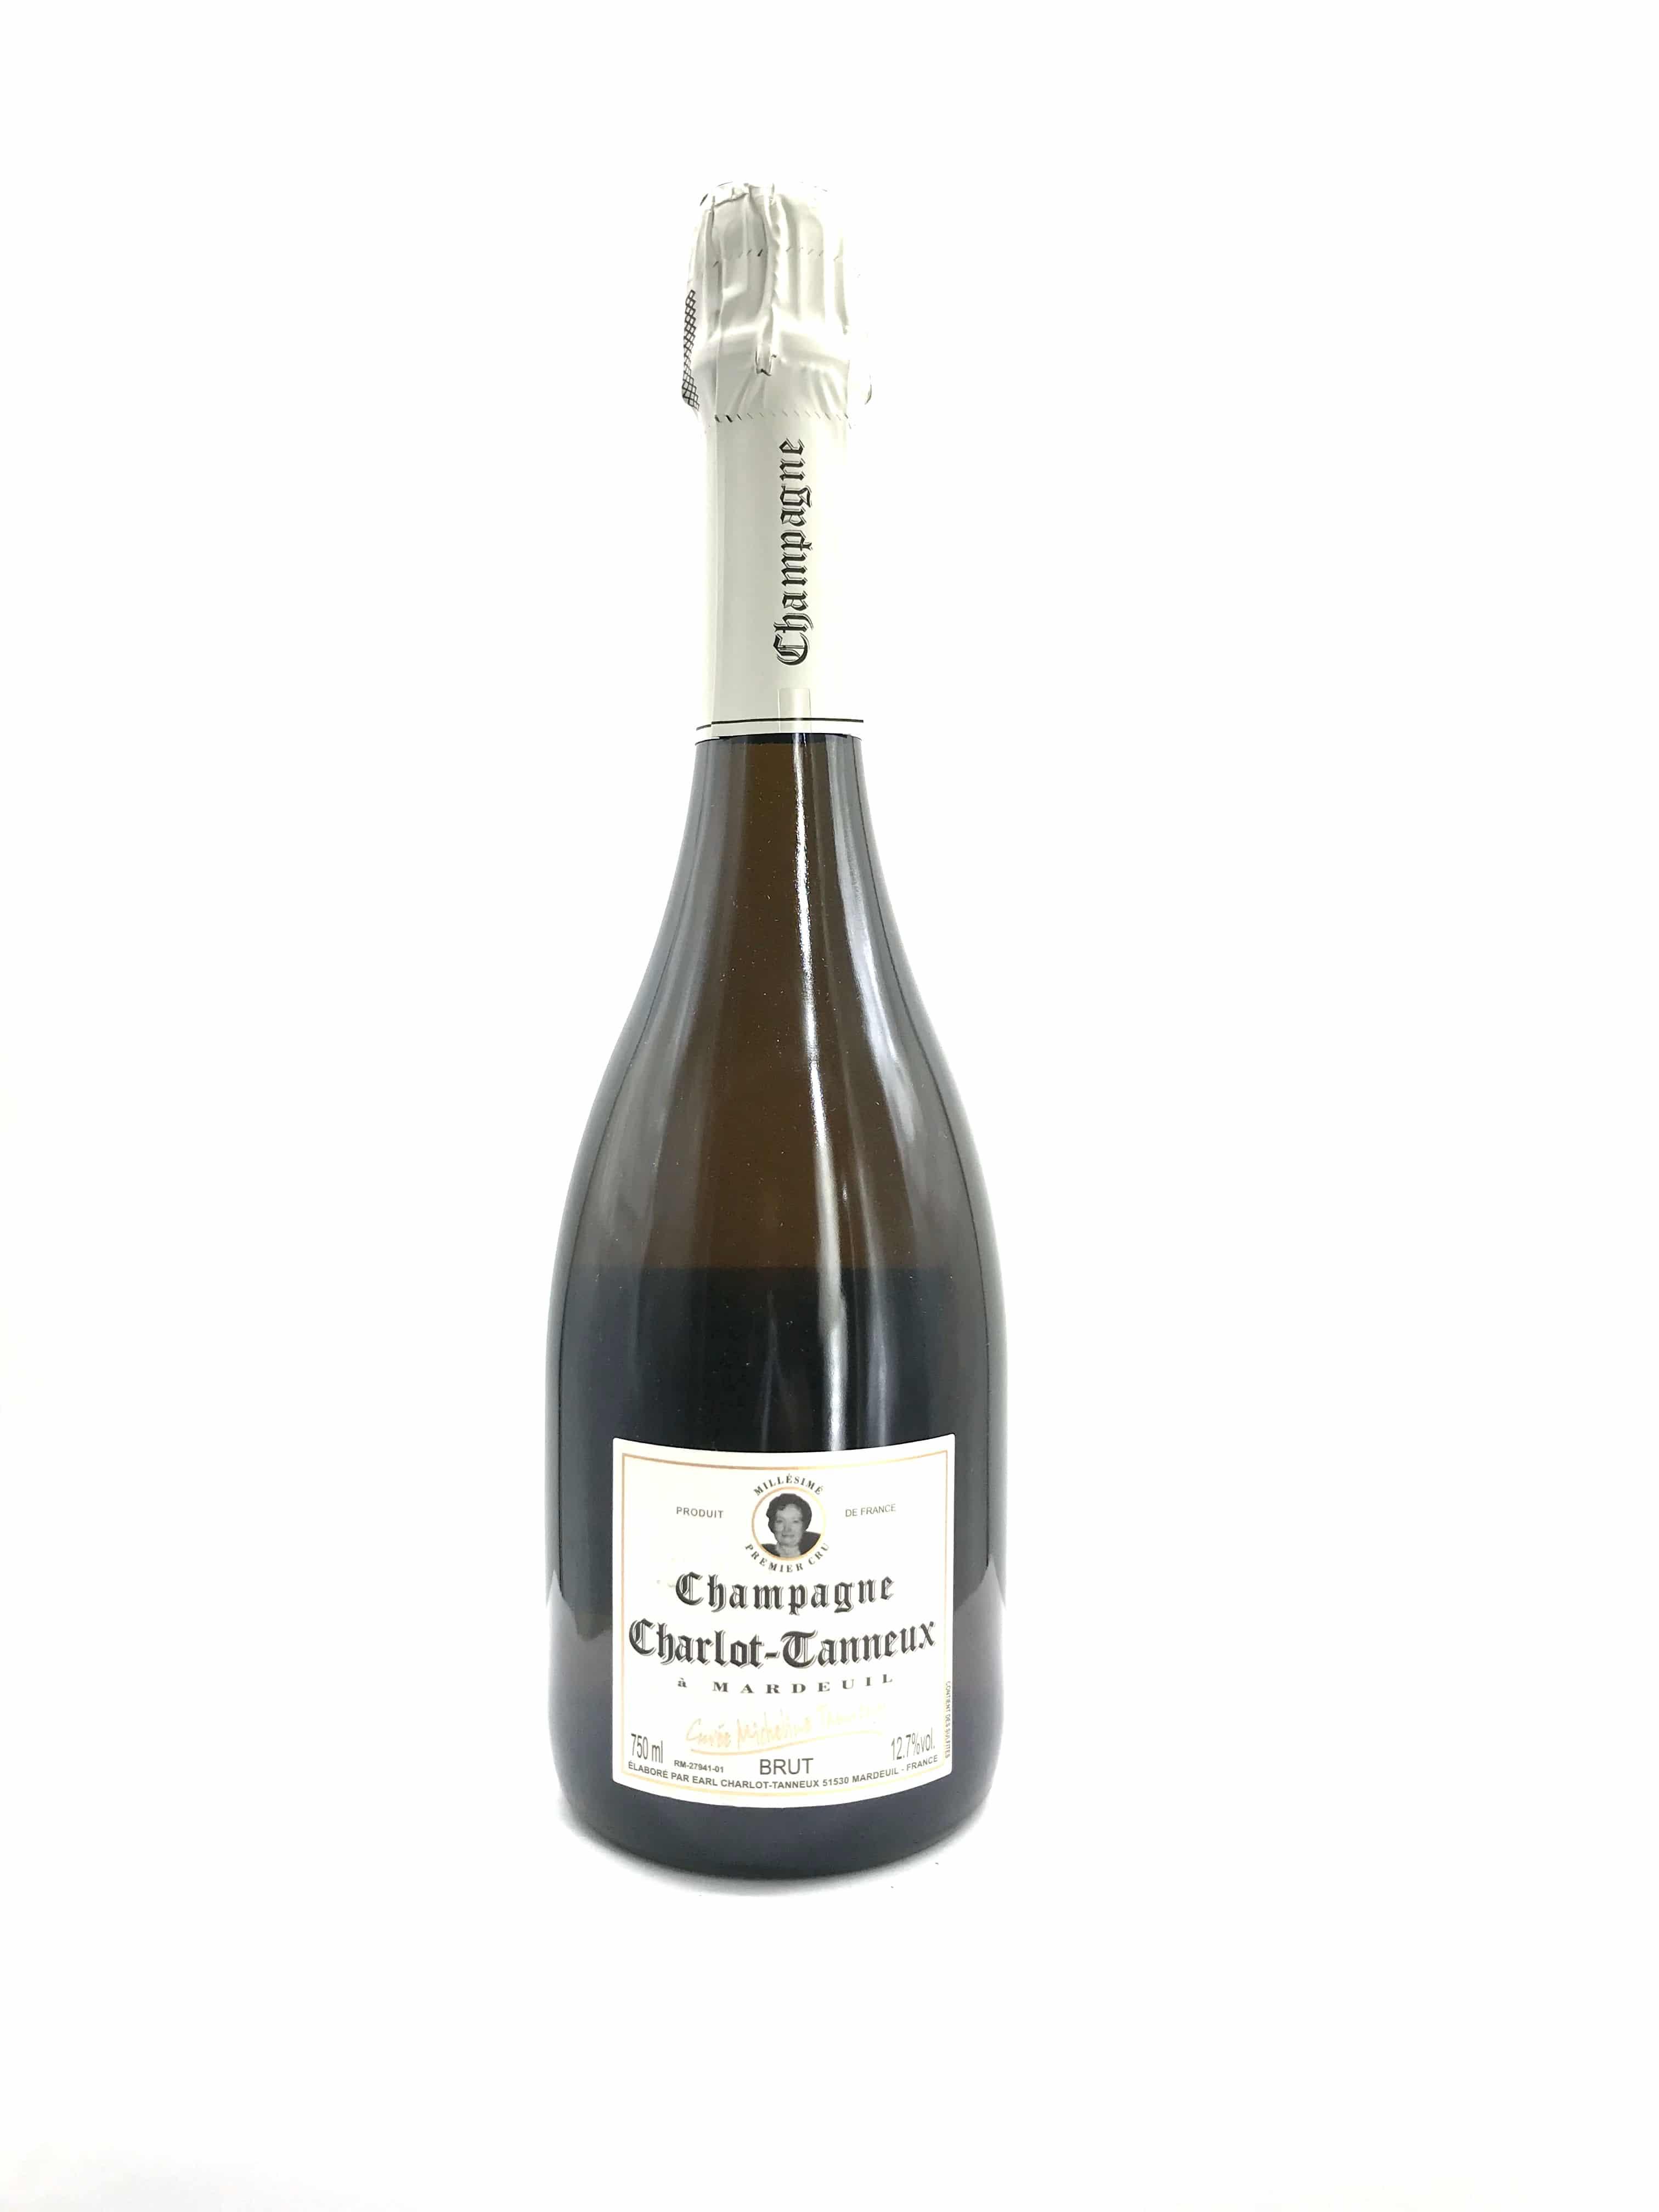 Champagne Charlot Tanneux Cuvee Micheline